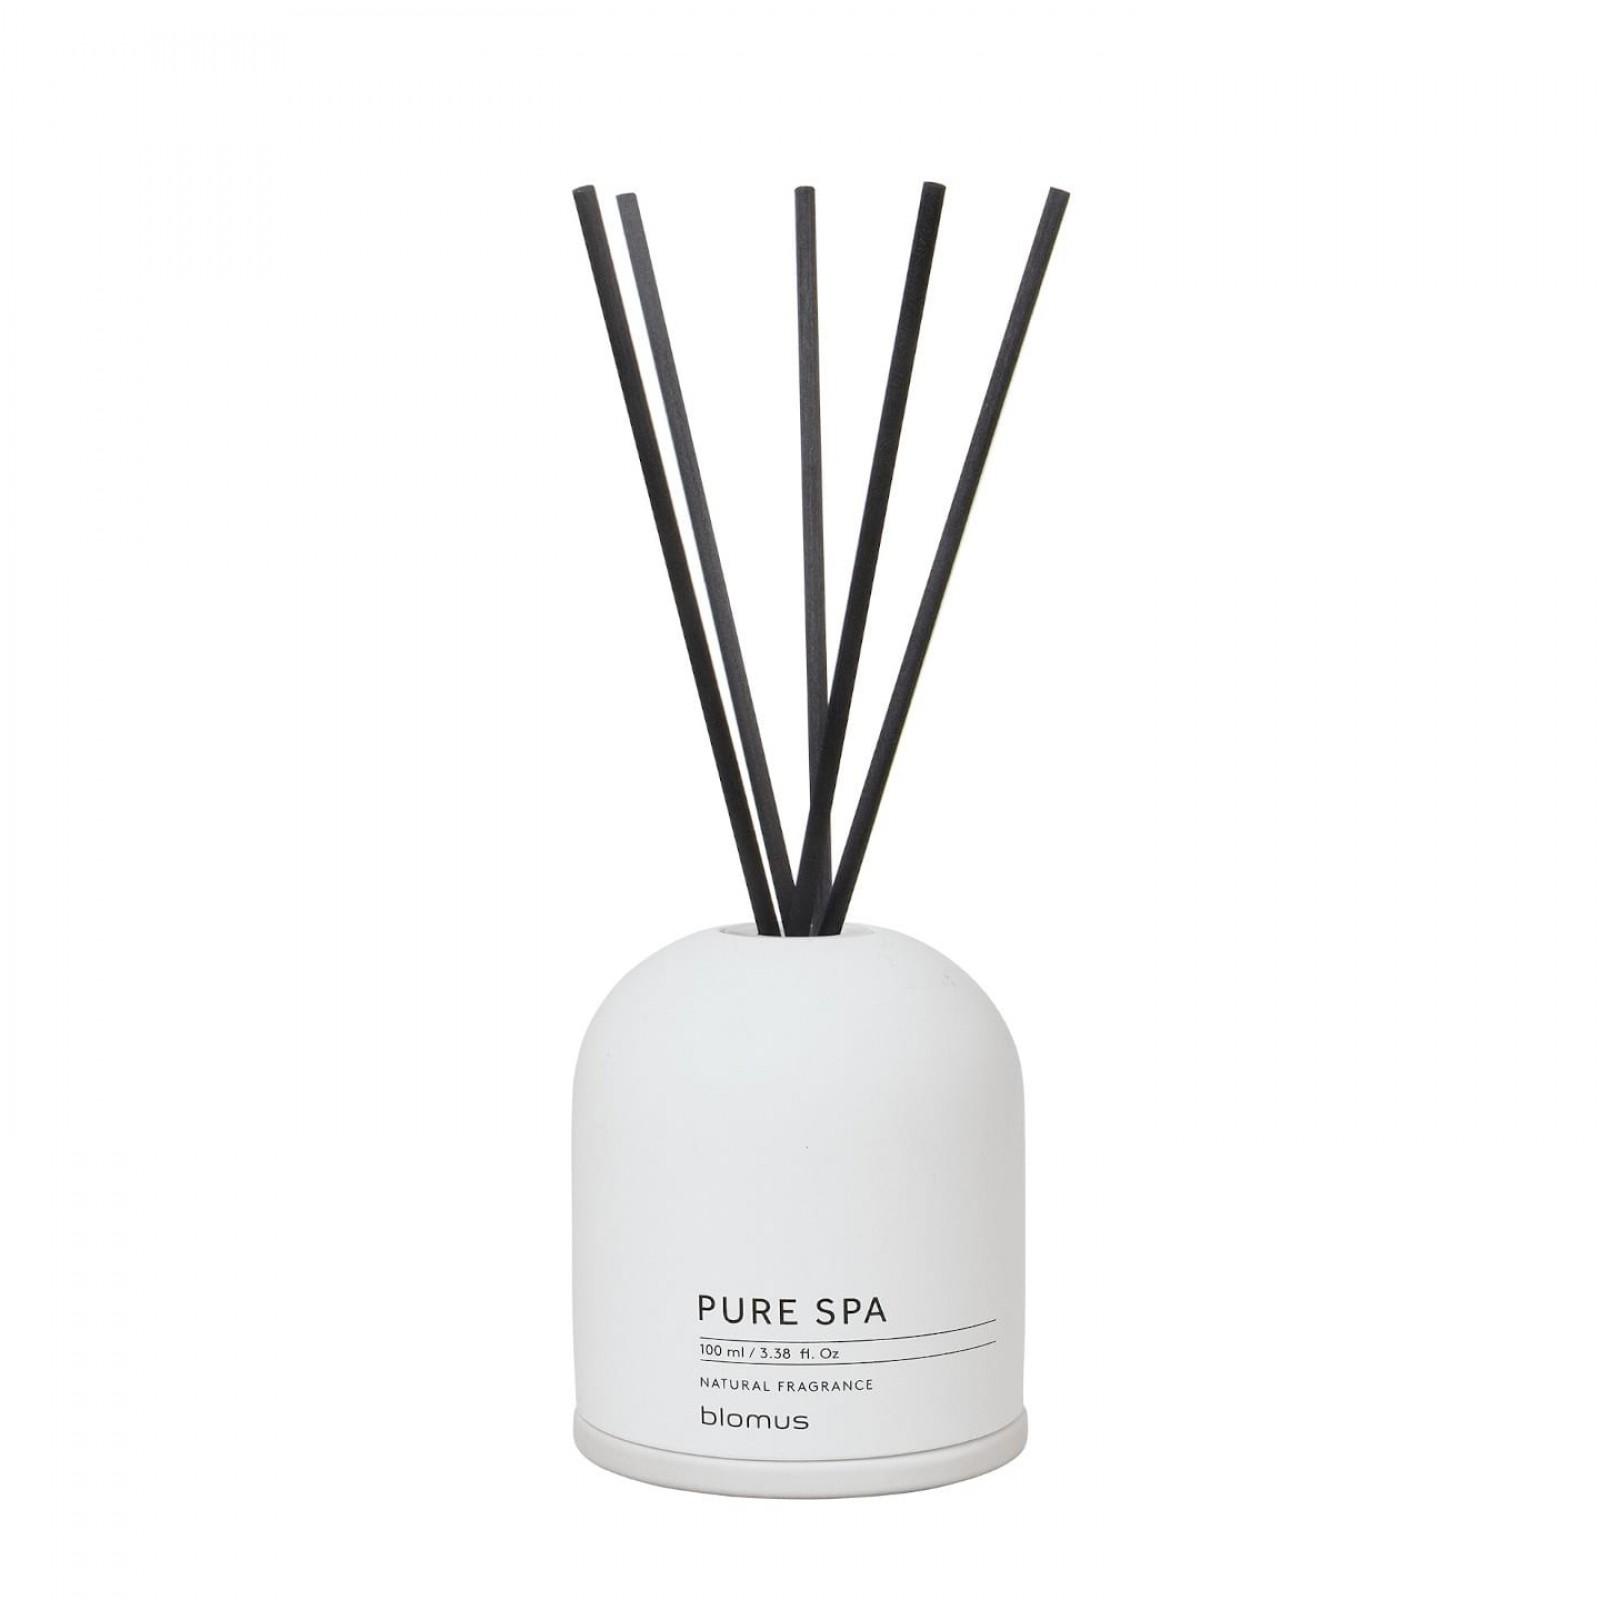 Fraga Room Fragrance Set French Cotton (Lily White) - Blomus